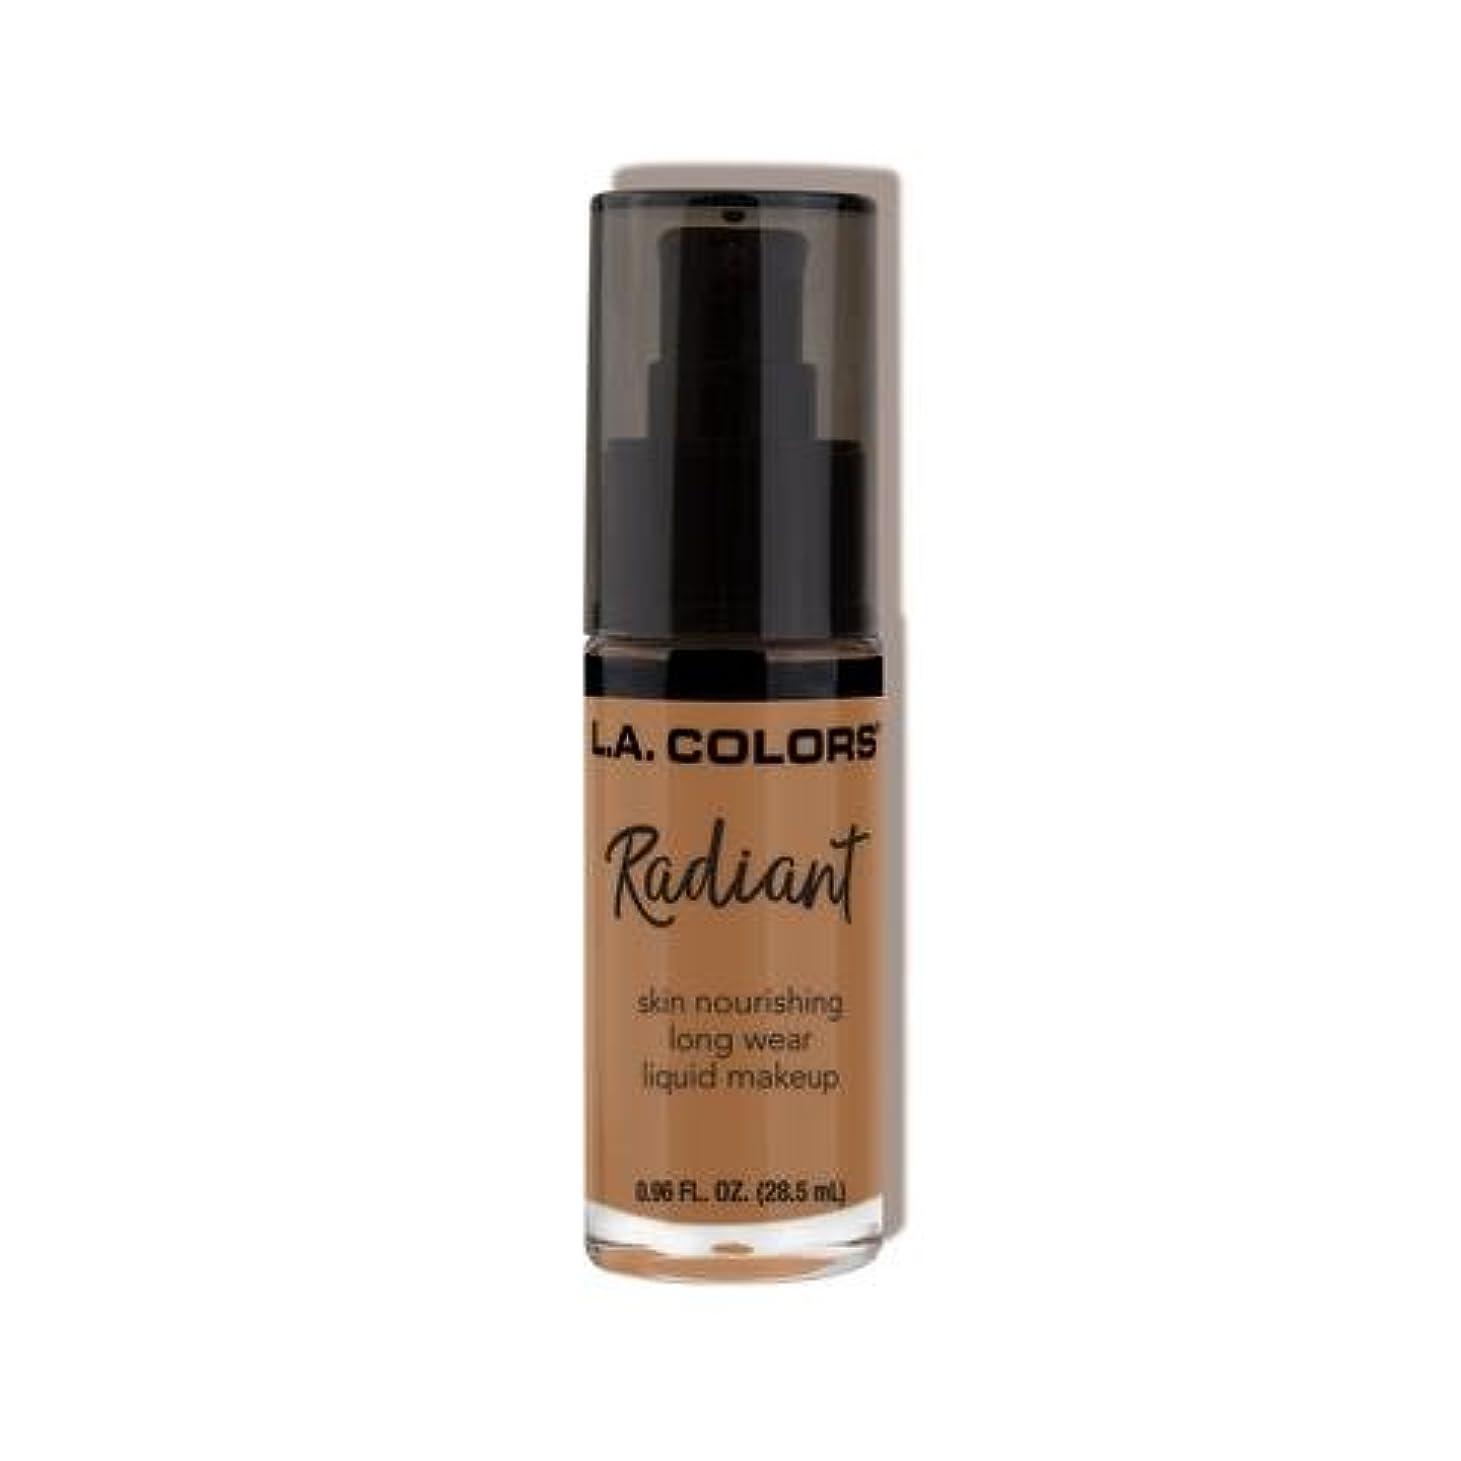 収益咳梨(6 Pack) L.A. COLORS Radiant Liquid Makeup - Chestnut (並行輸入品)